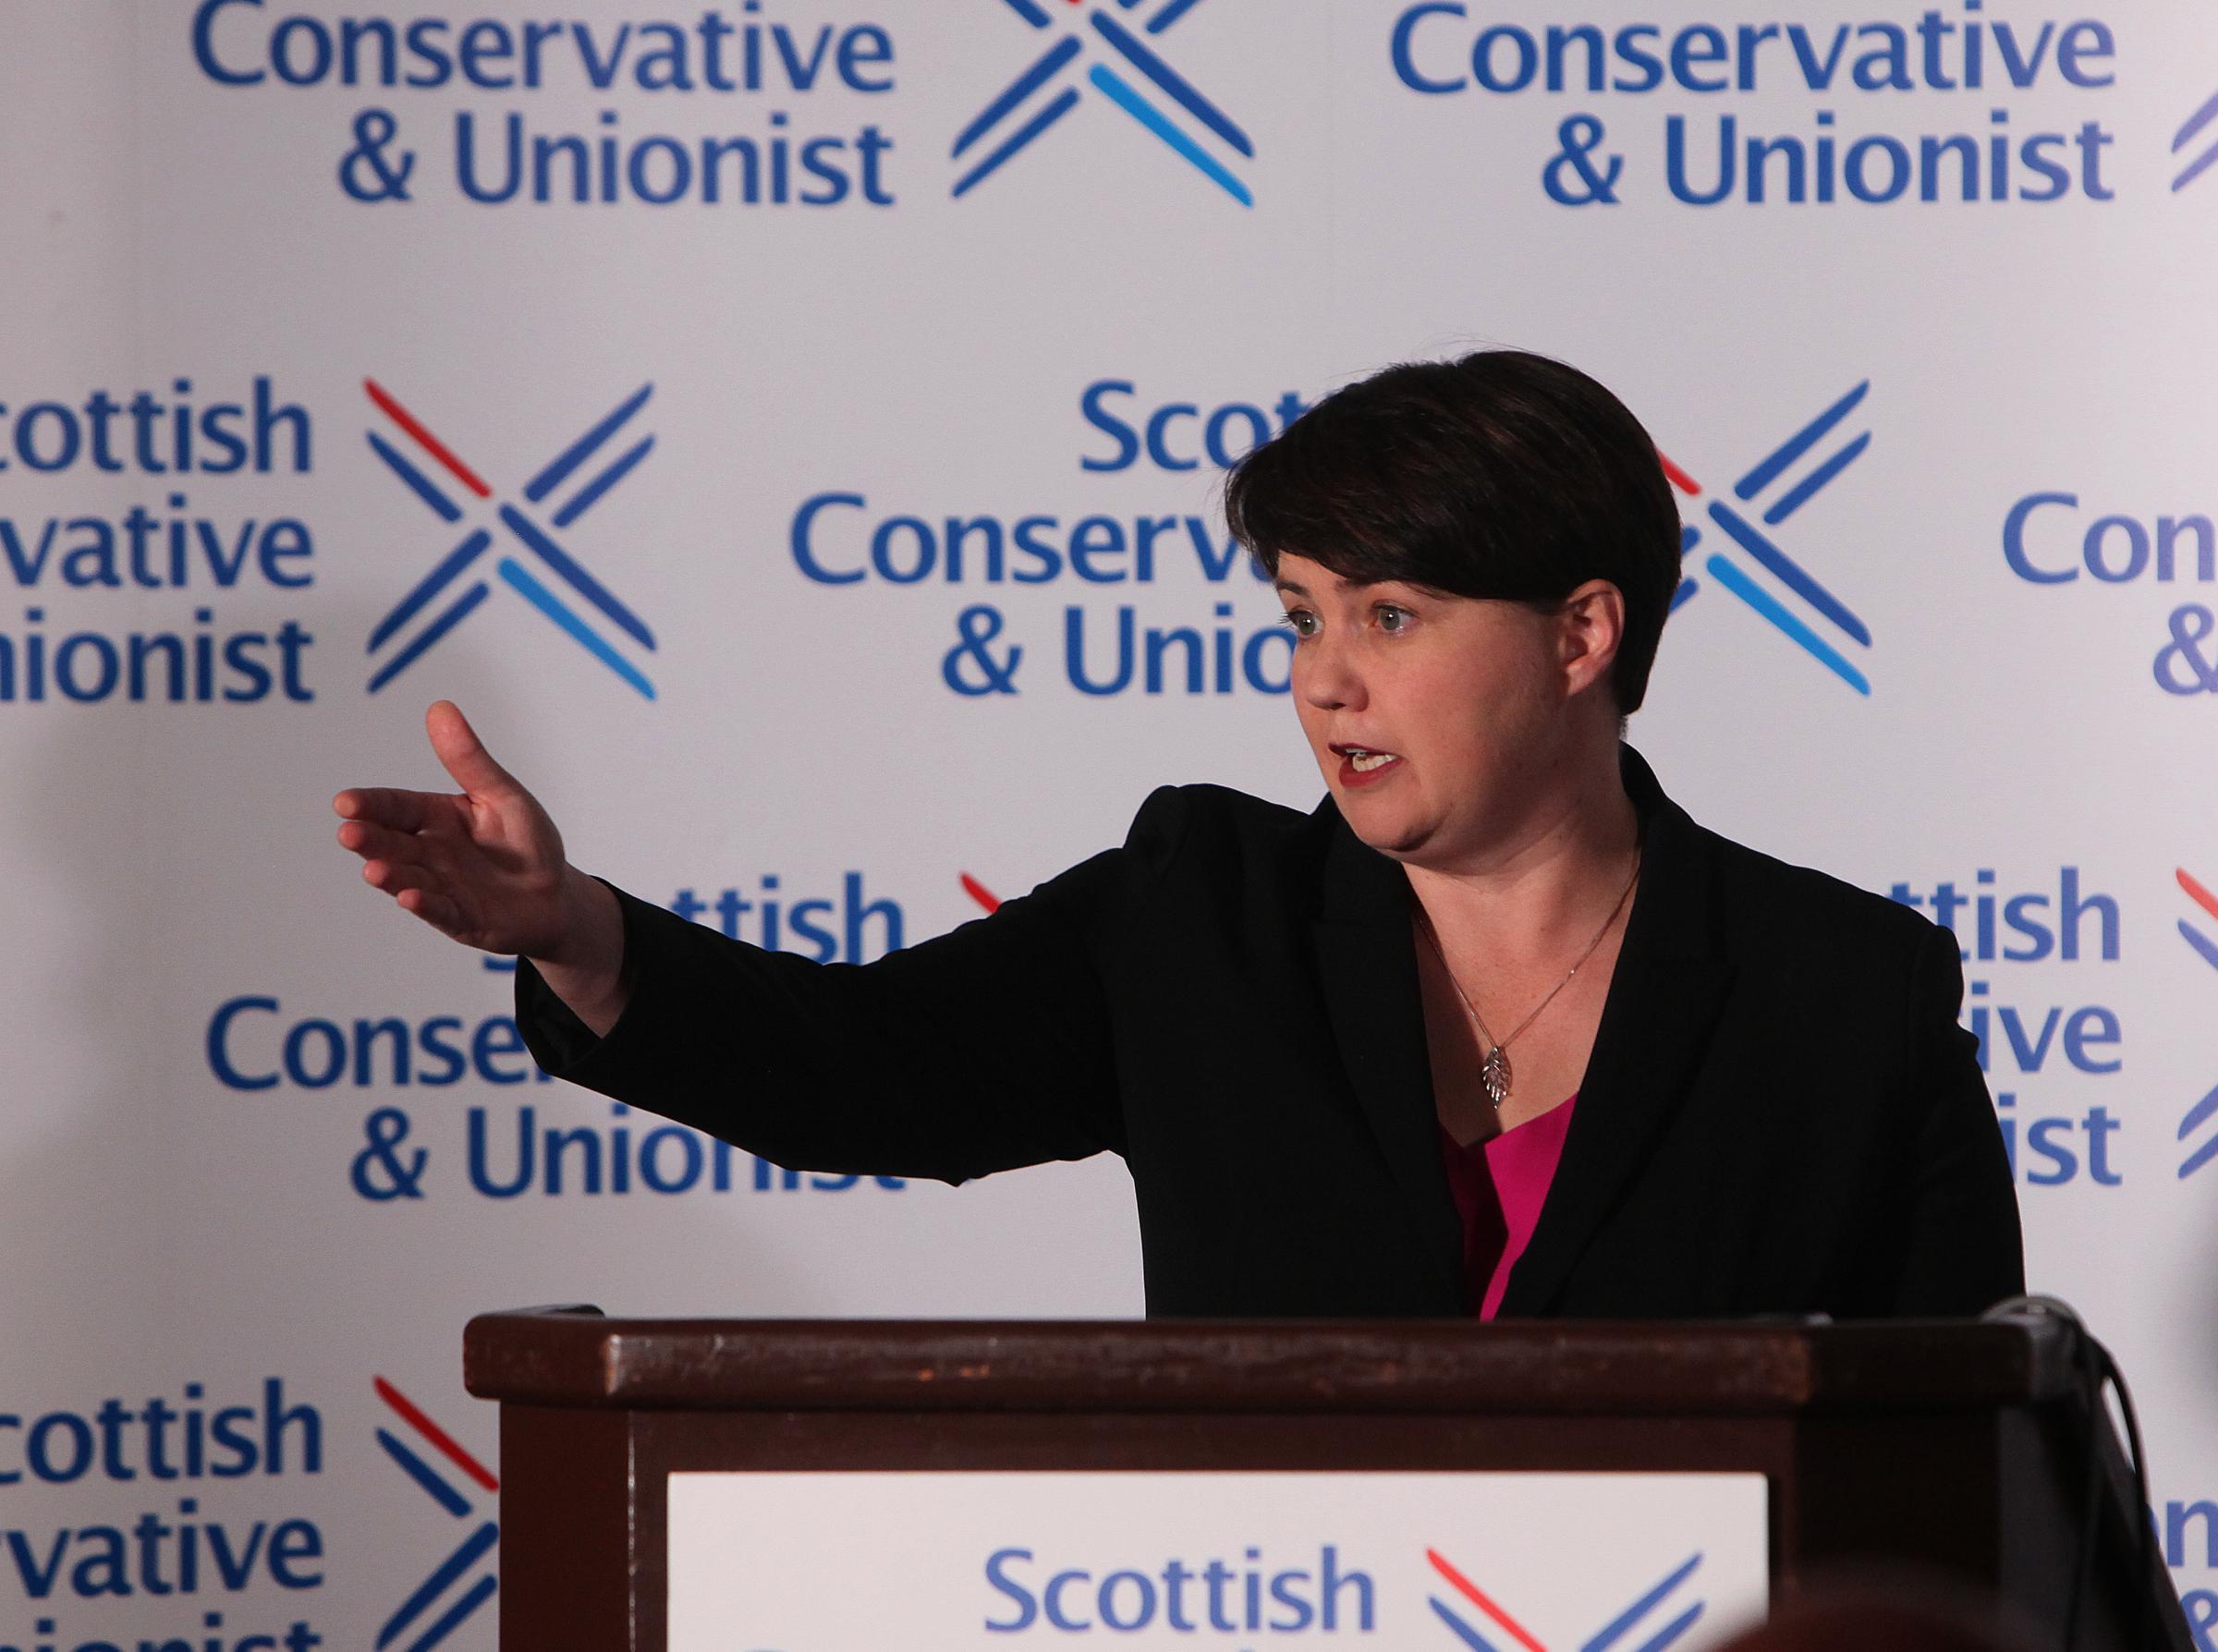 Ruth Davidson: Boris Johnson's Brexit tactics left me 'hopelessly conflicted'